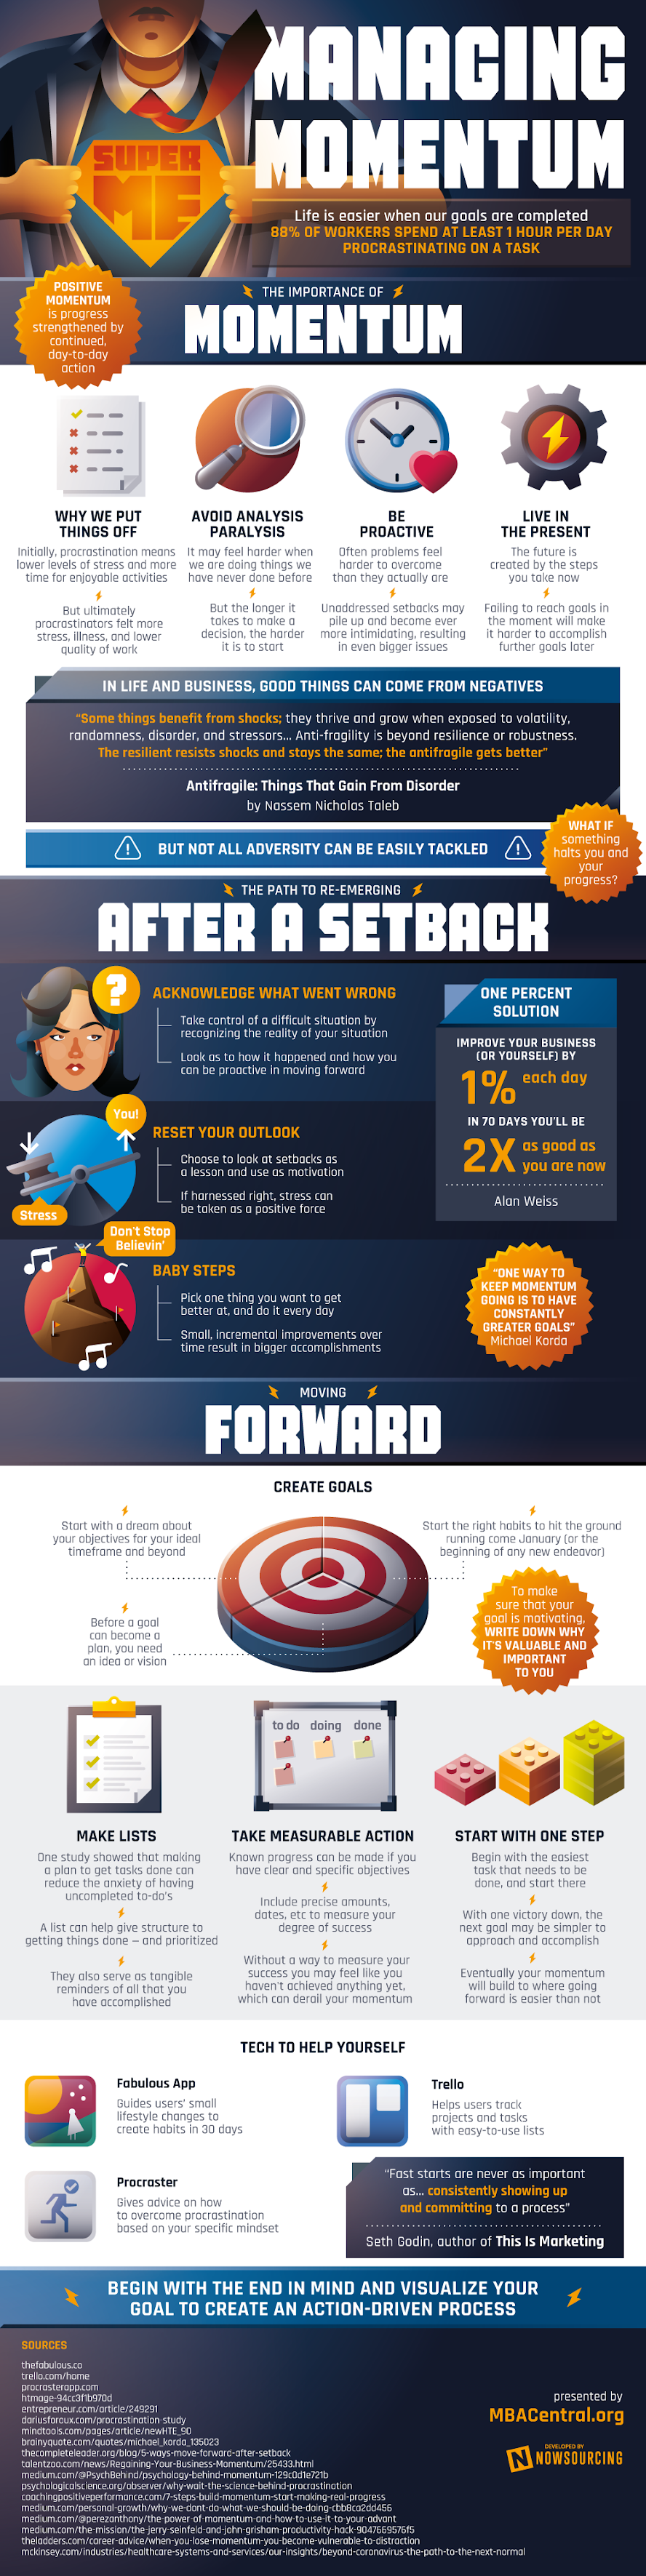 Managing Momentum #infographic